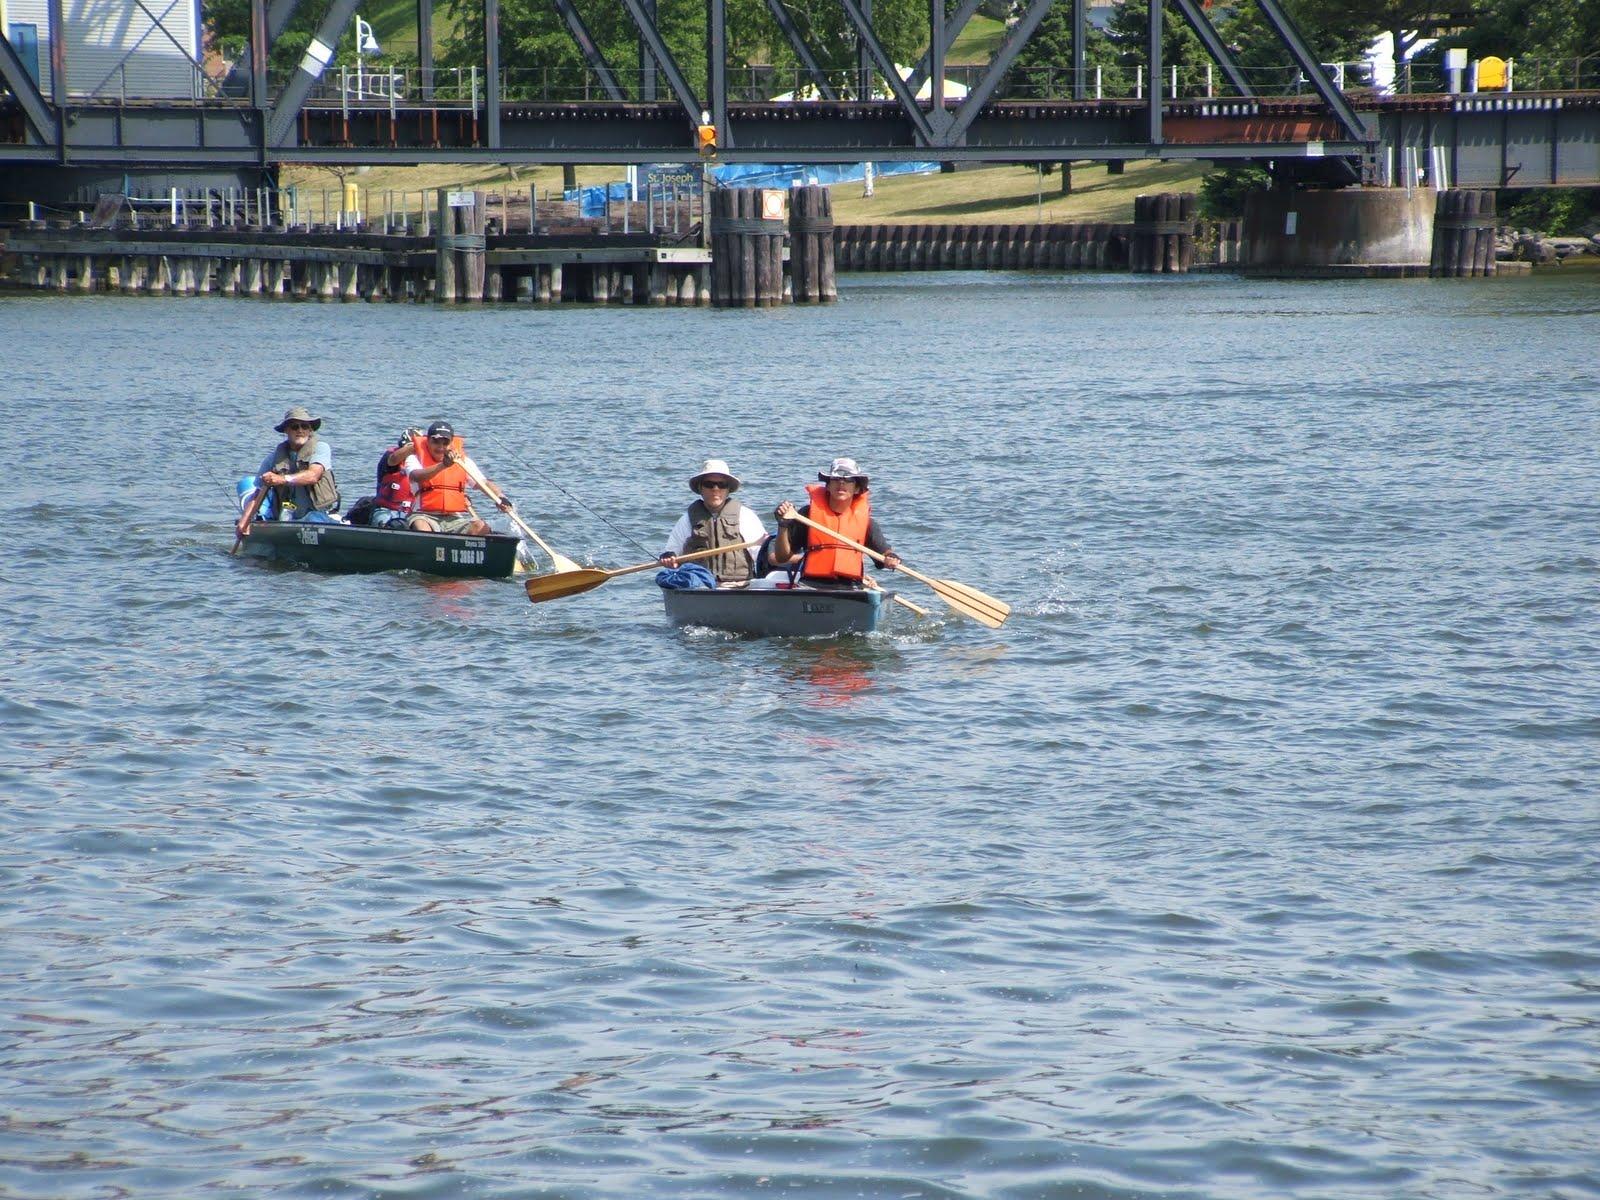 Canoe camp cook fish and travel saint joseph river for Berrien springs fish cam